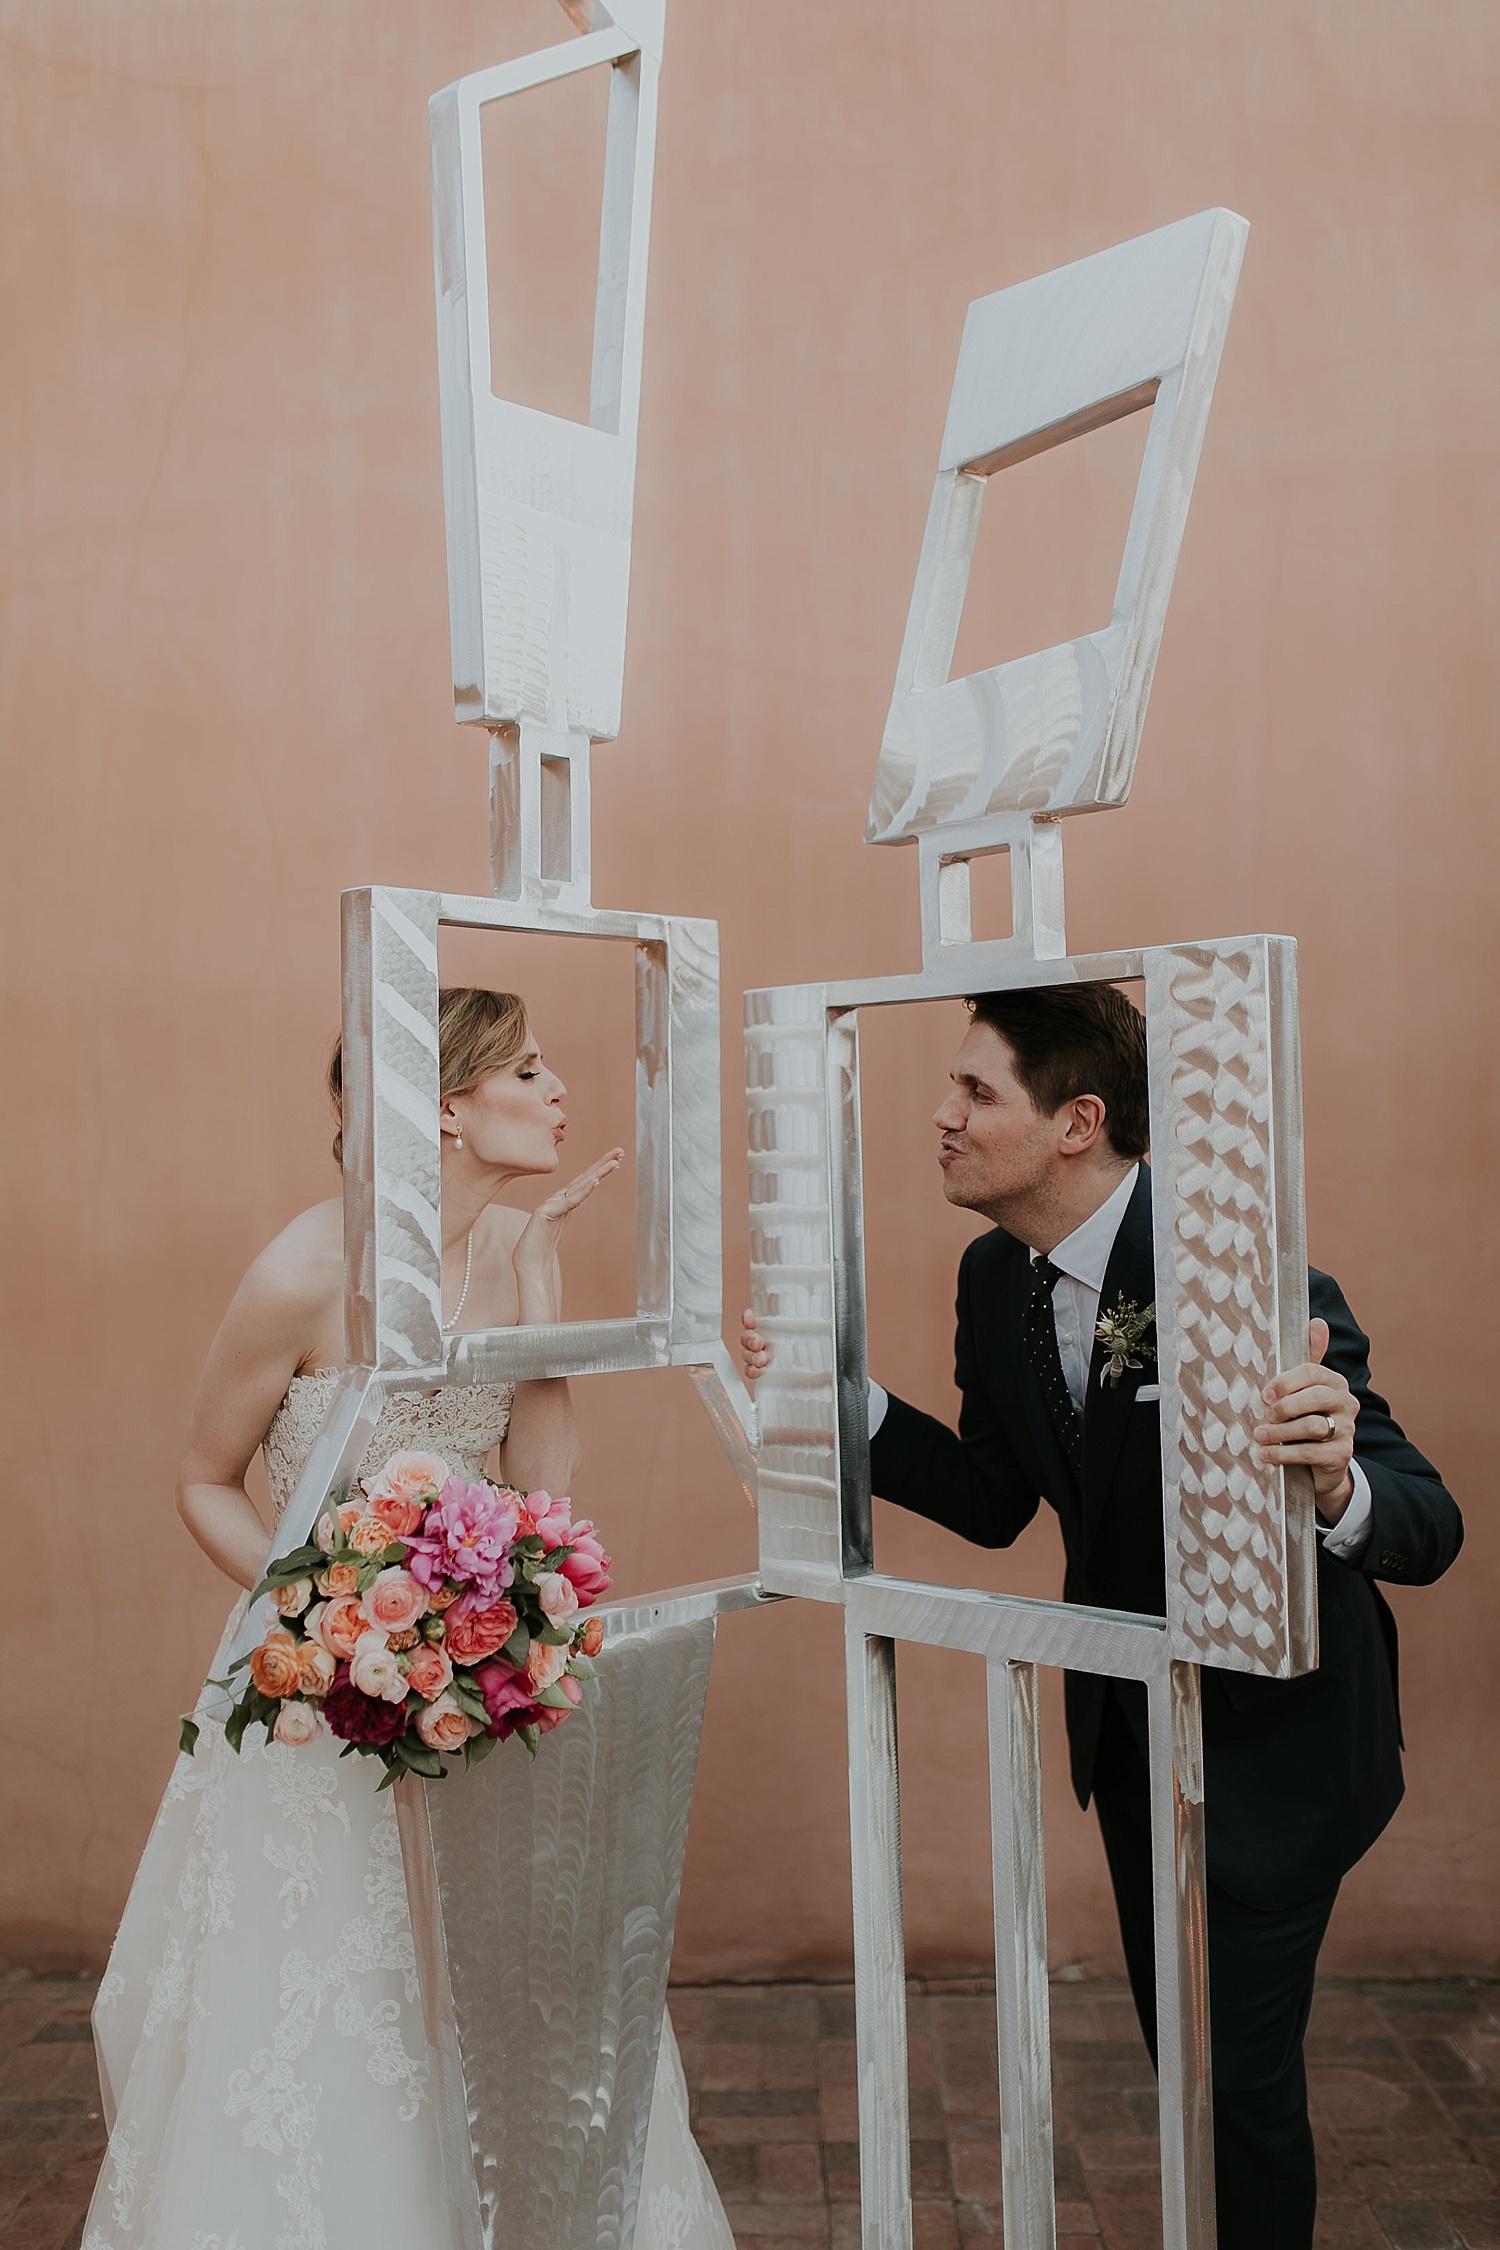 Alicia+lucia+photography+-+albuquerque+wedding+photographer+-+santa+fe+wedding+photography+-+new+mexico+wedding+photographer+-+gerald+peters+gallery+wedding_0061.jpg